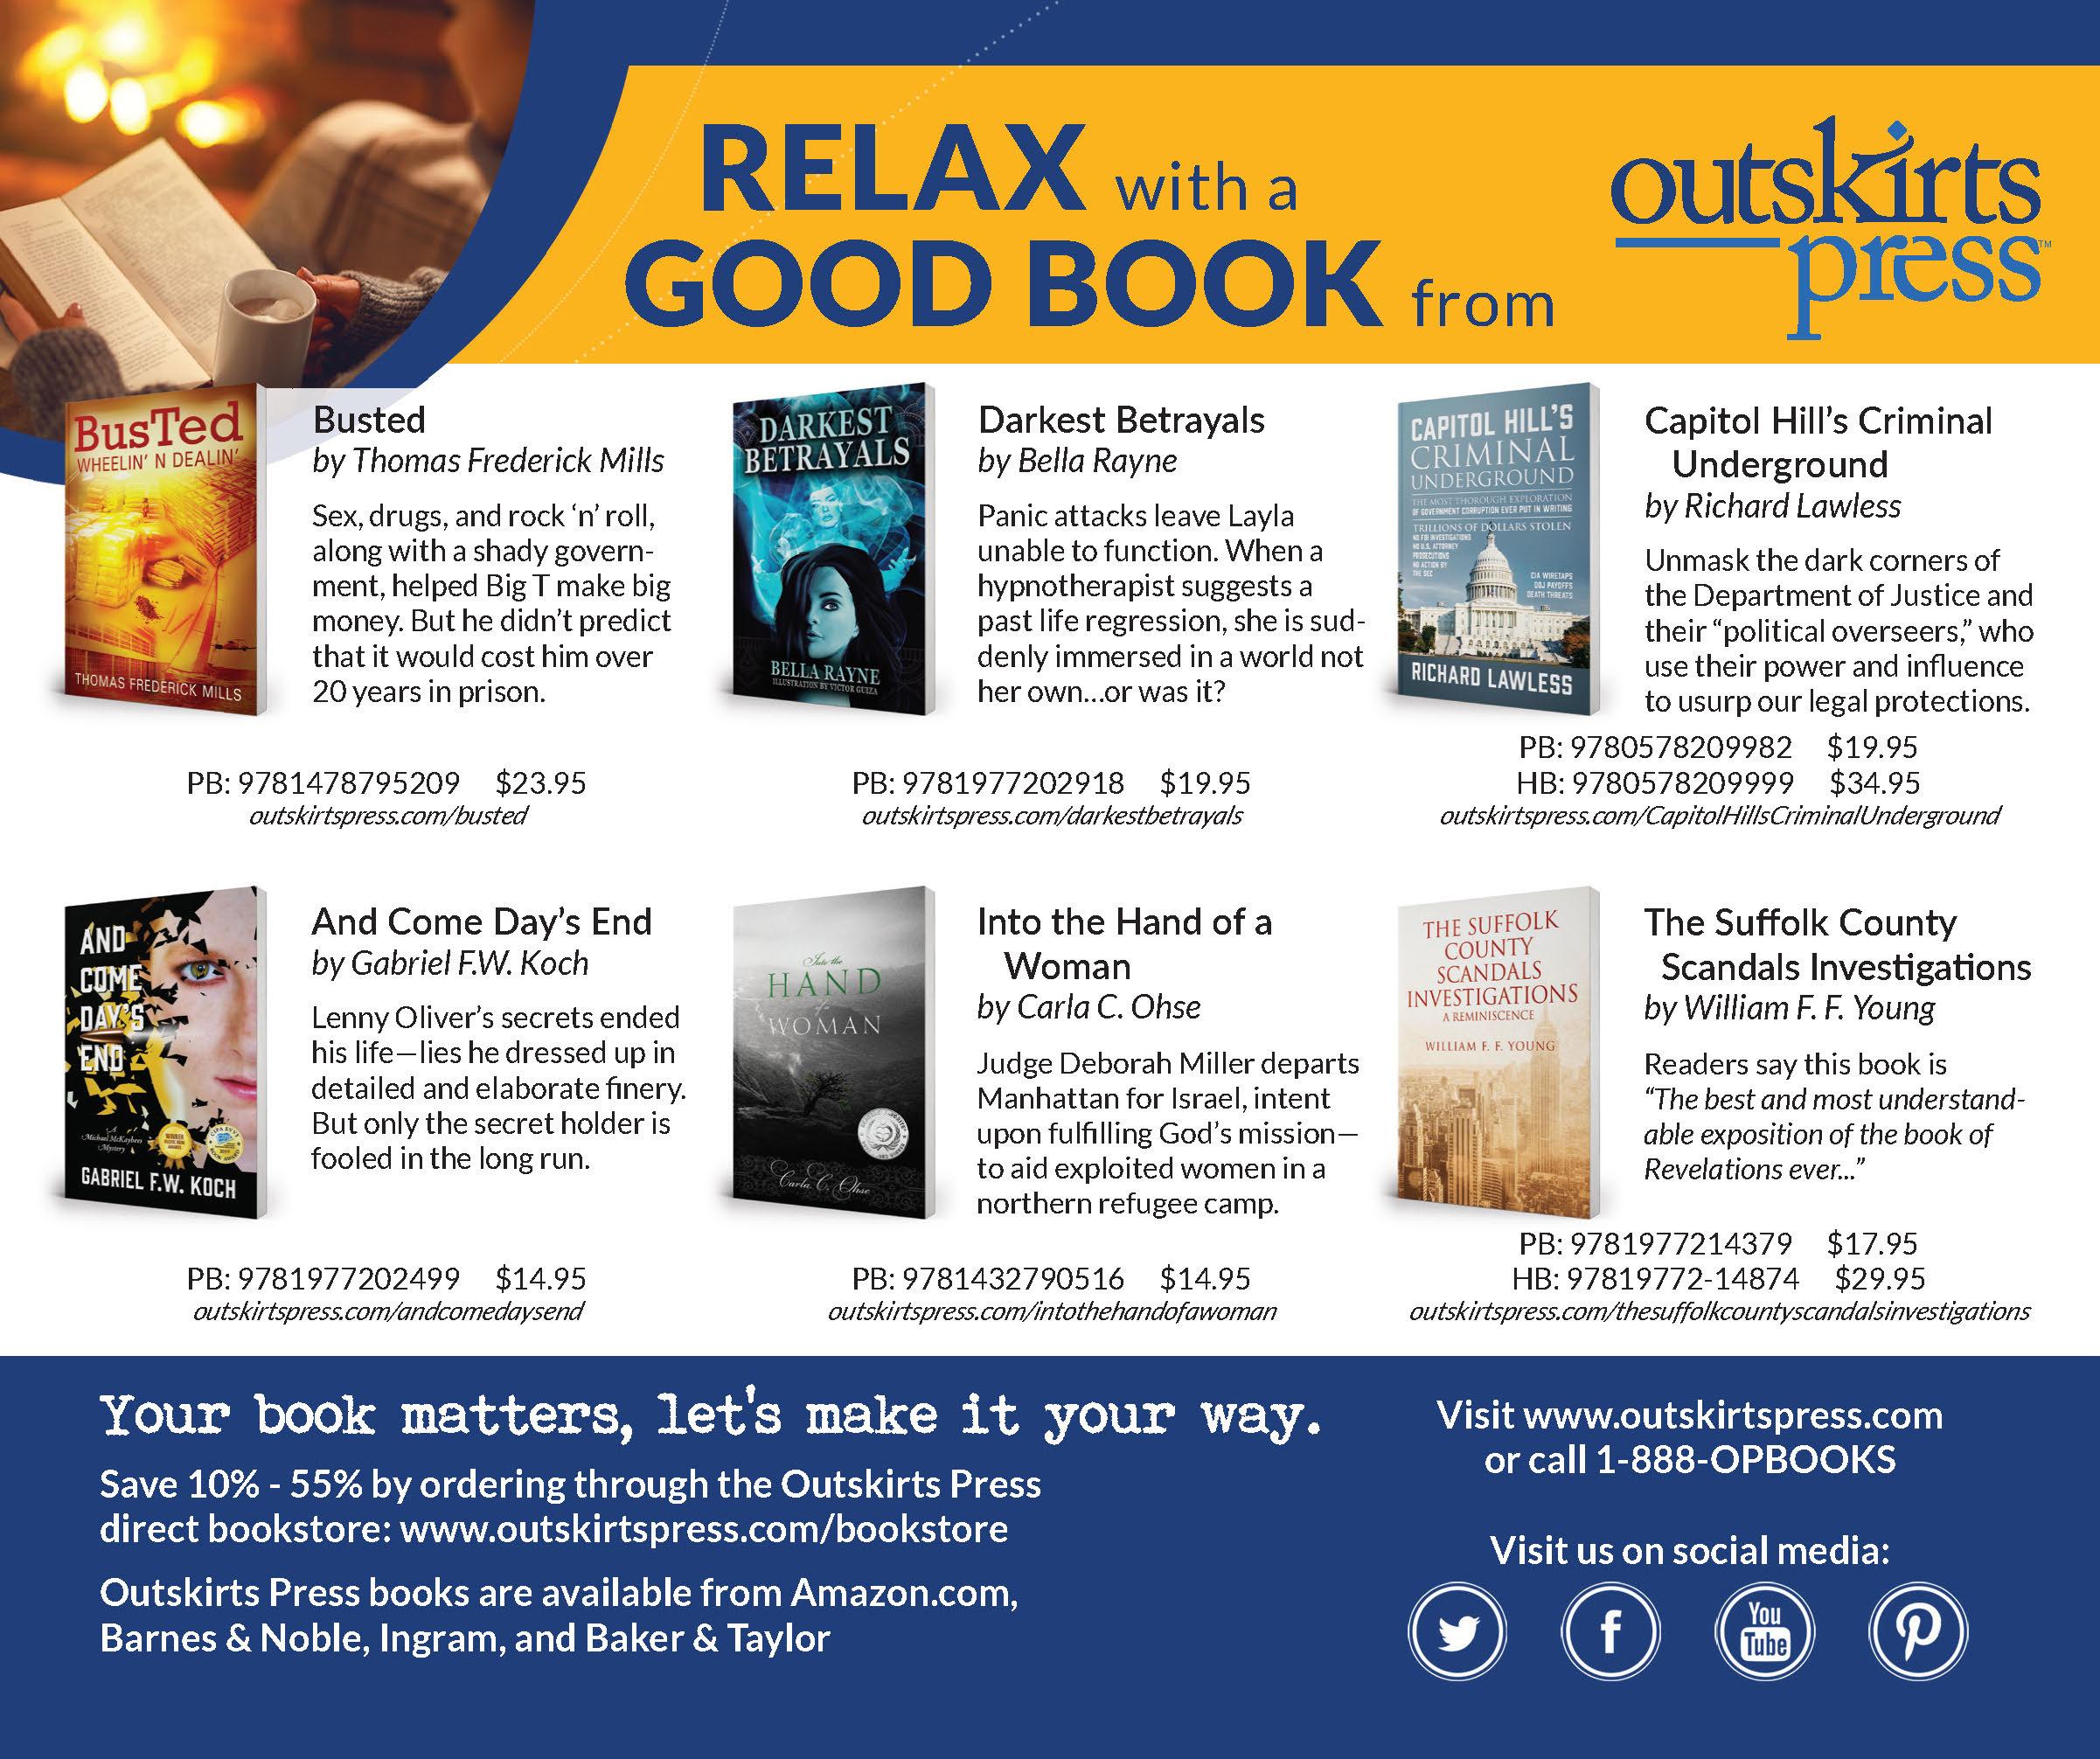 self publishing oc-op advertising